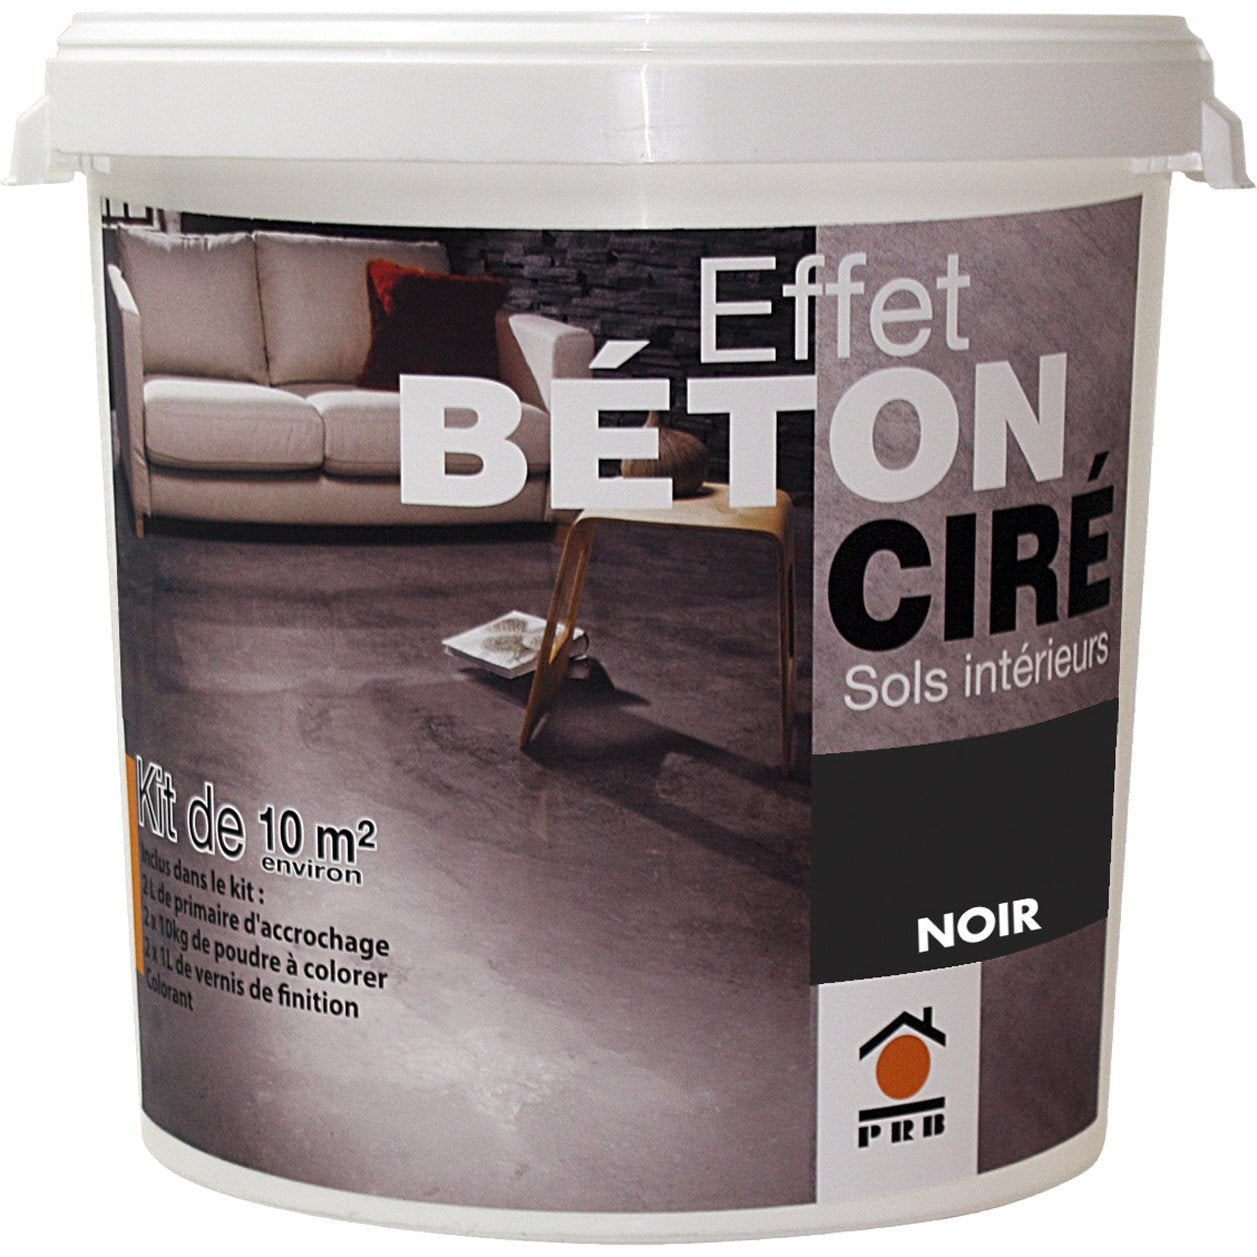 B ton effet cir ivoire prb 10m leroy merlin - Beton cire exterieur leroy merlin ...